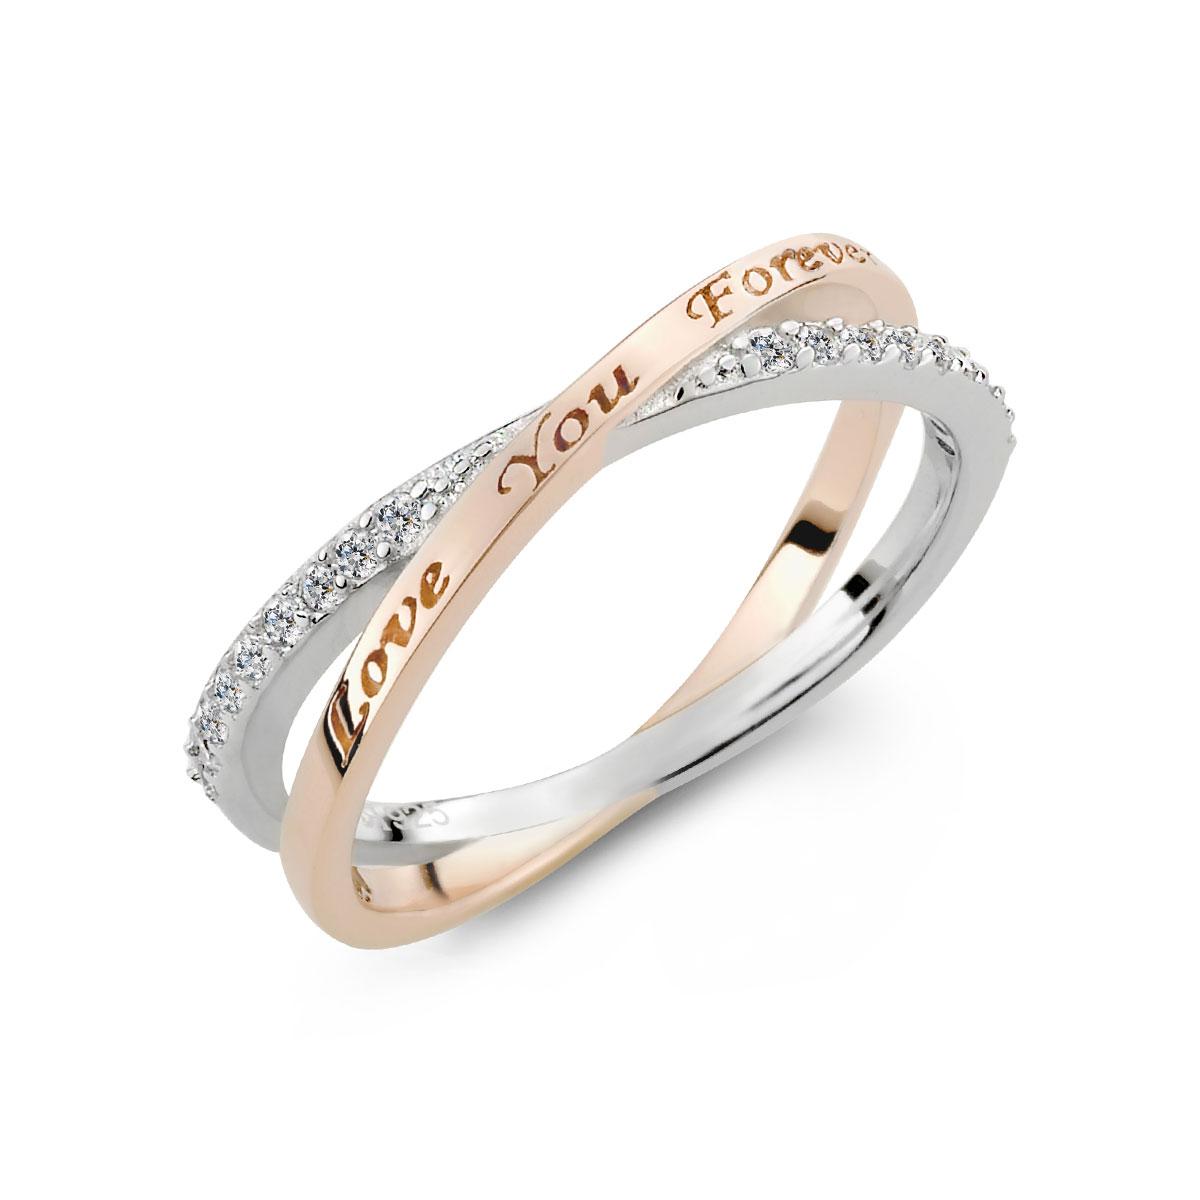 KSW295 彼此永遠的愛交叉戒指